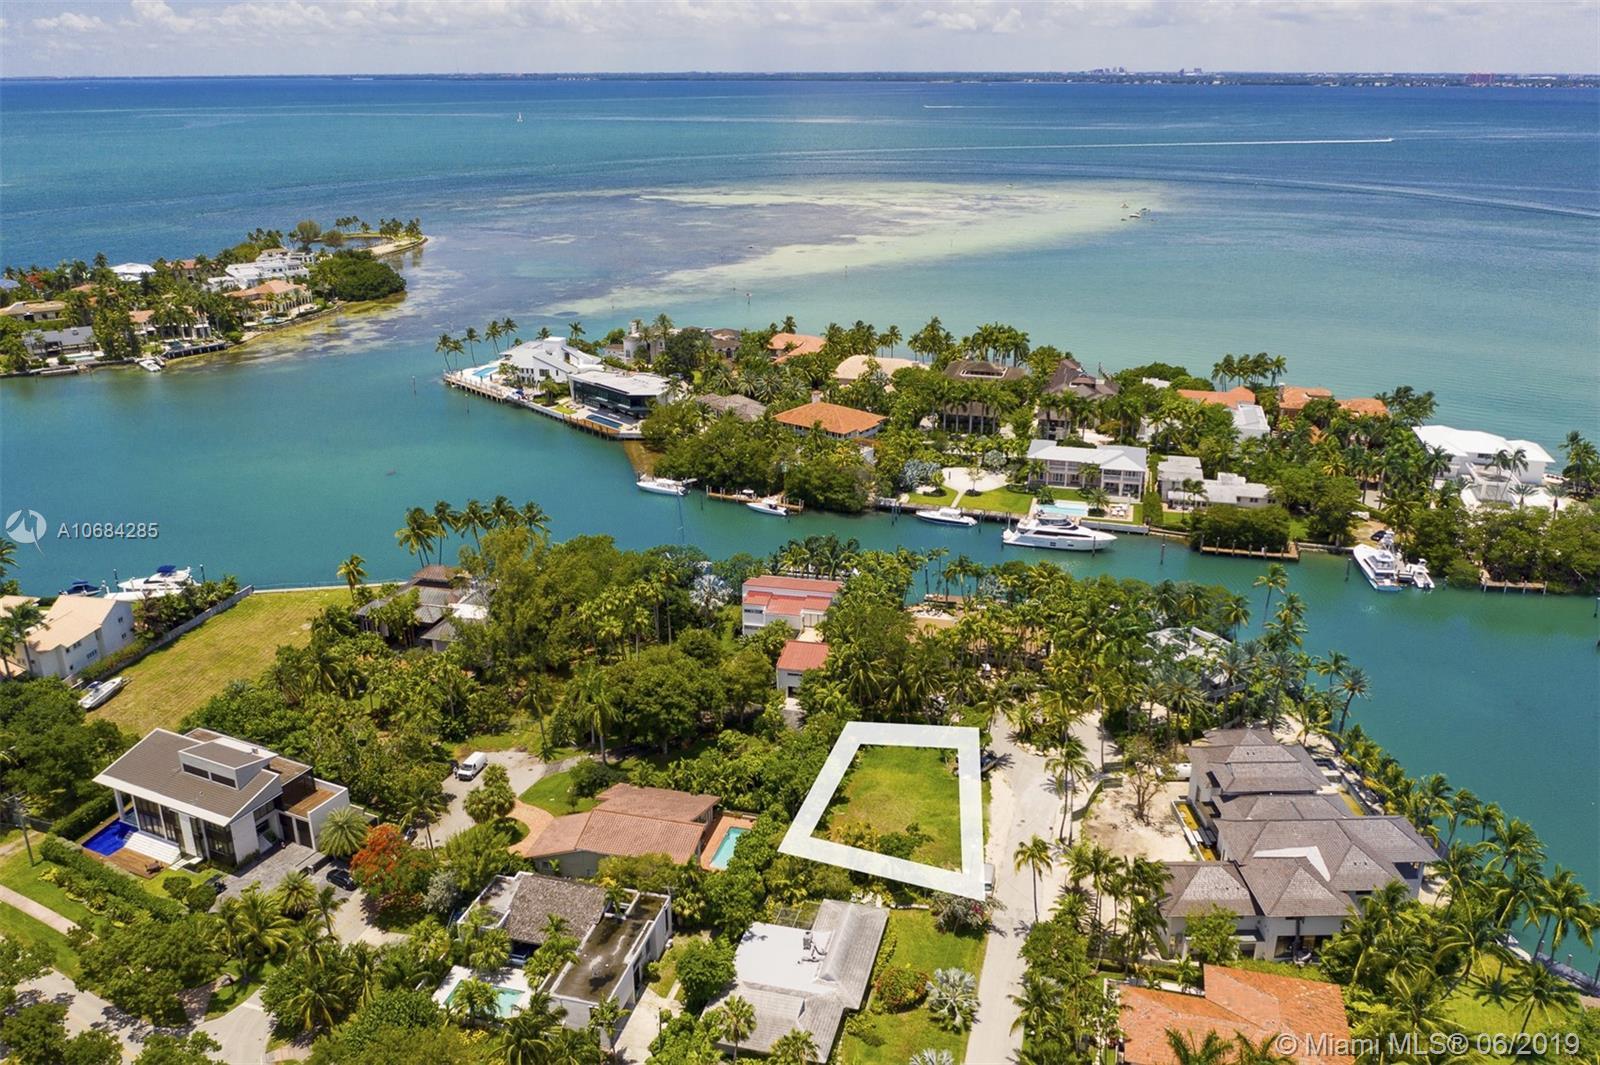 image #1 of property, Harbor Cove Rev Plat Pb 76